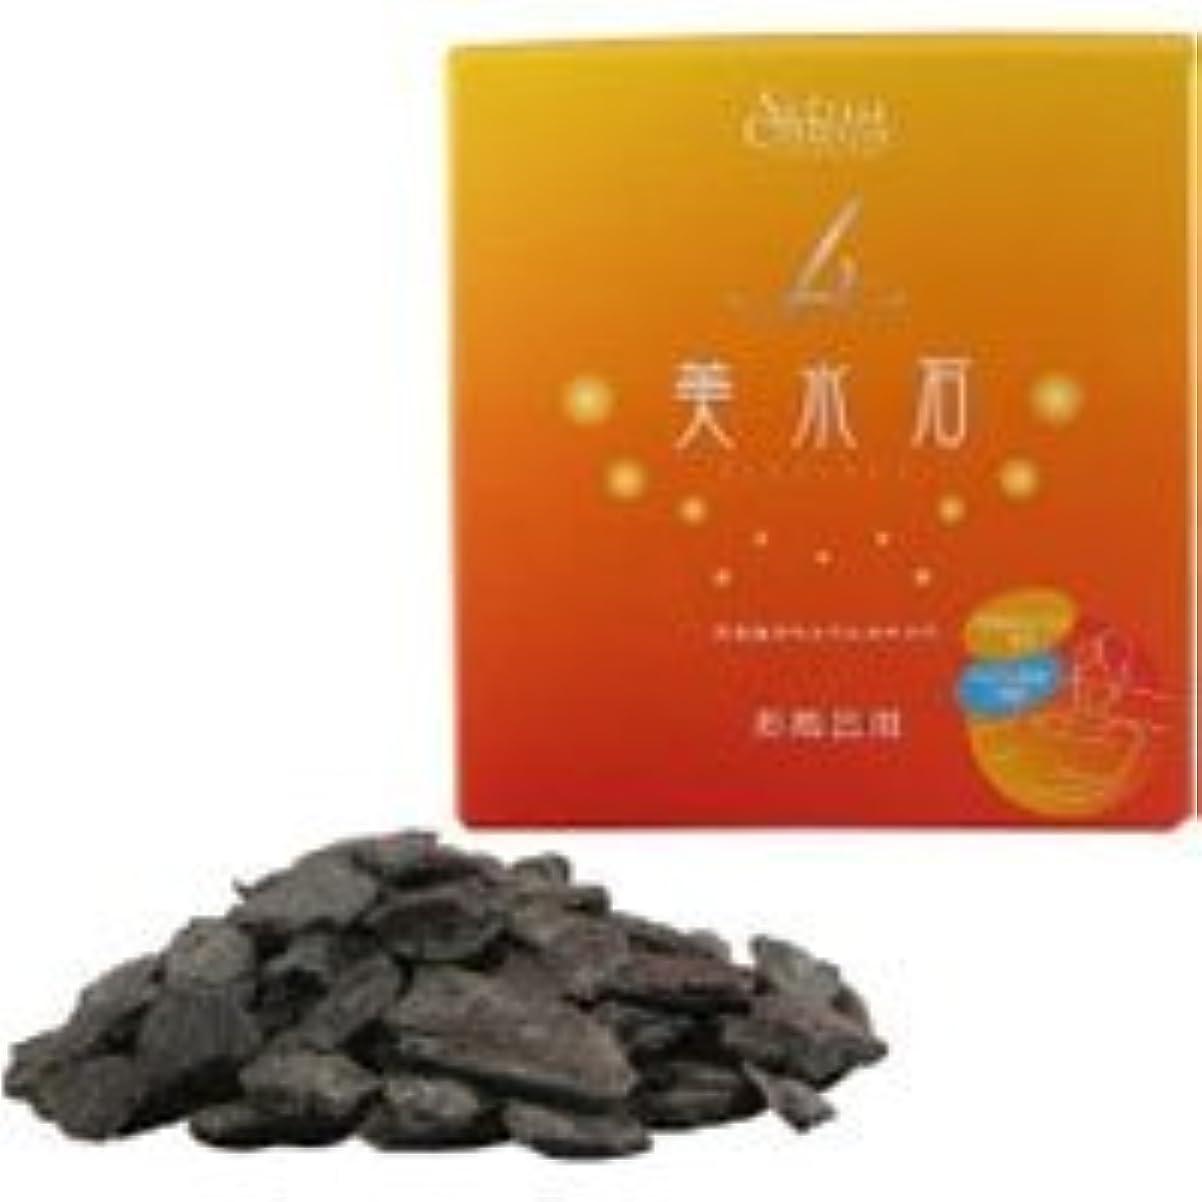 国家無実評価可能美水石 美水石お風呂用 (専用ネット1枚) 1kg